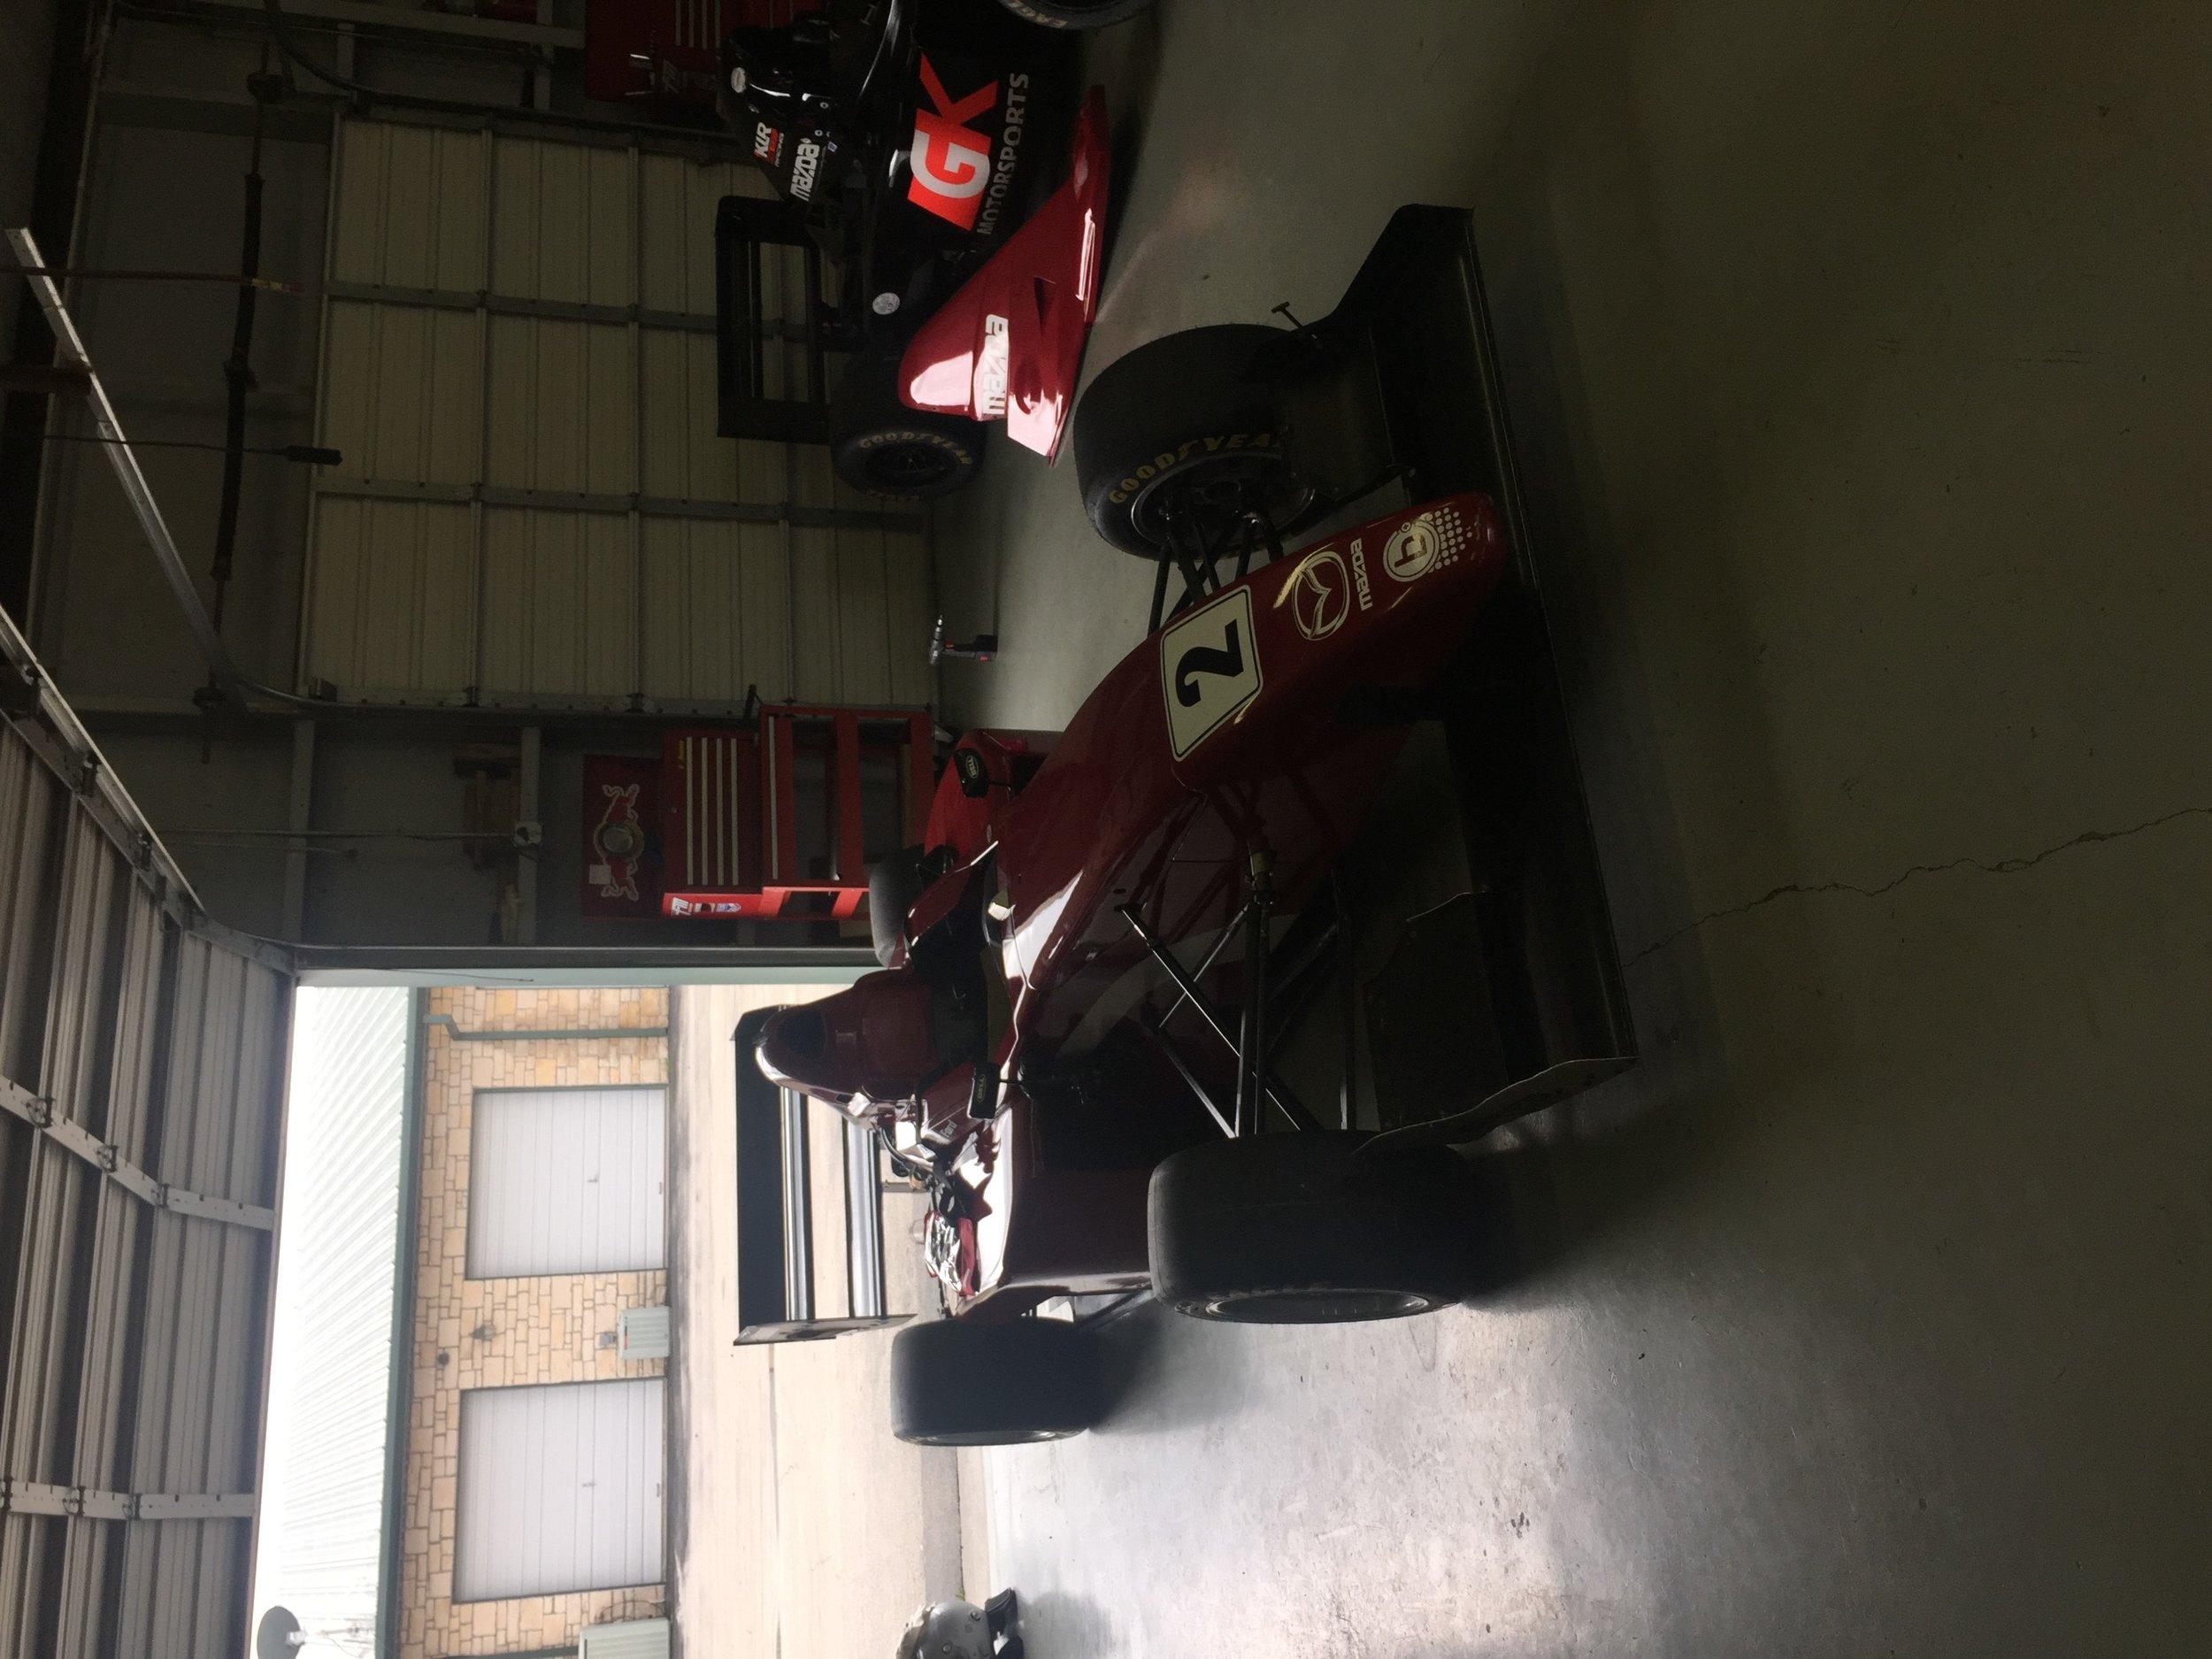 PFM front-in garage at Texas Motorsports  March 17.jpg